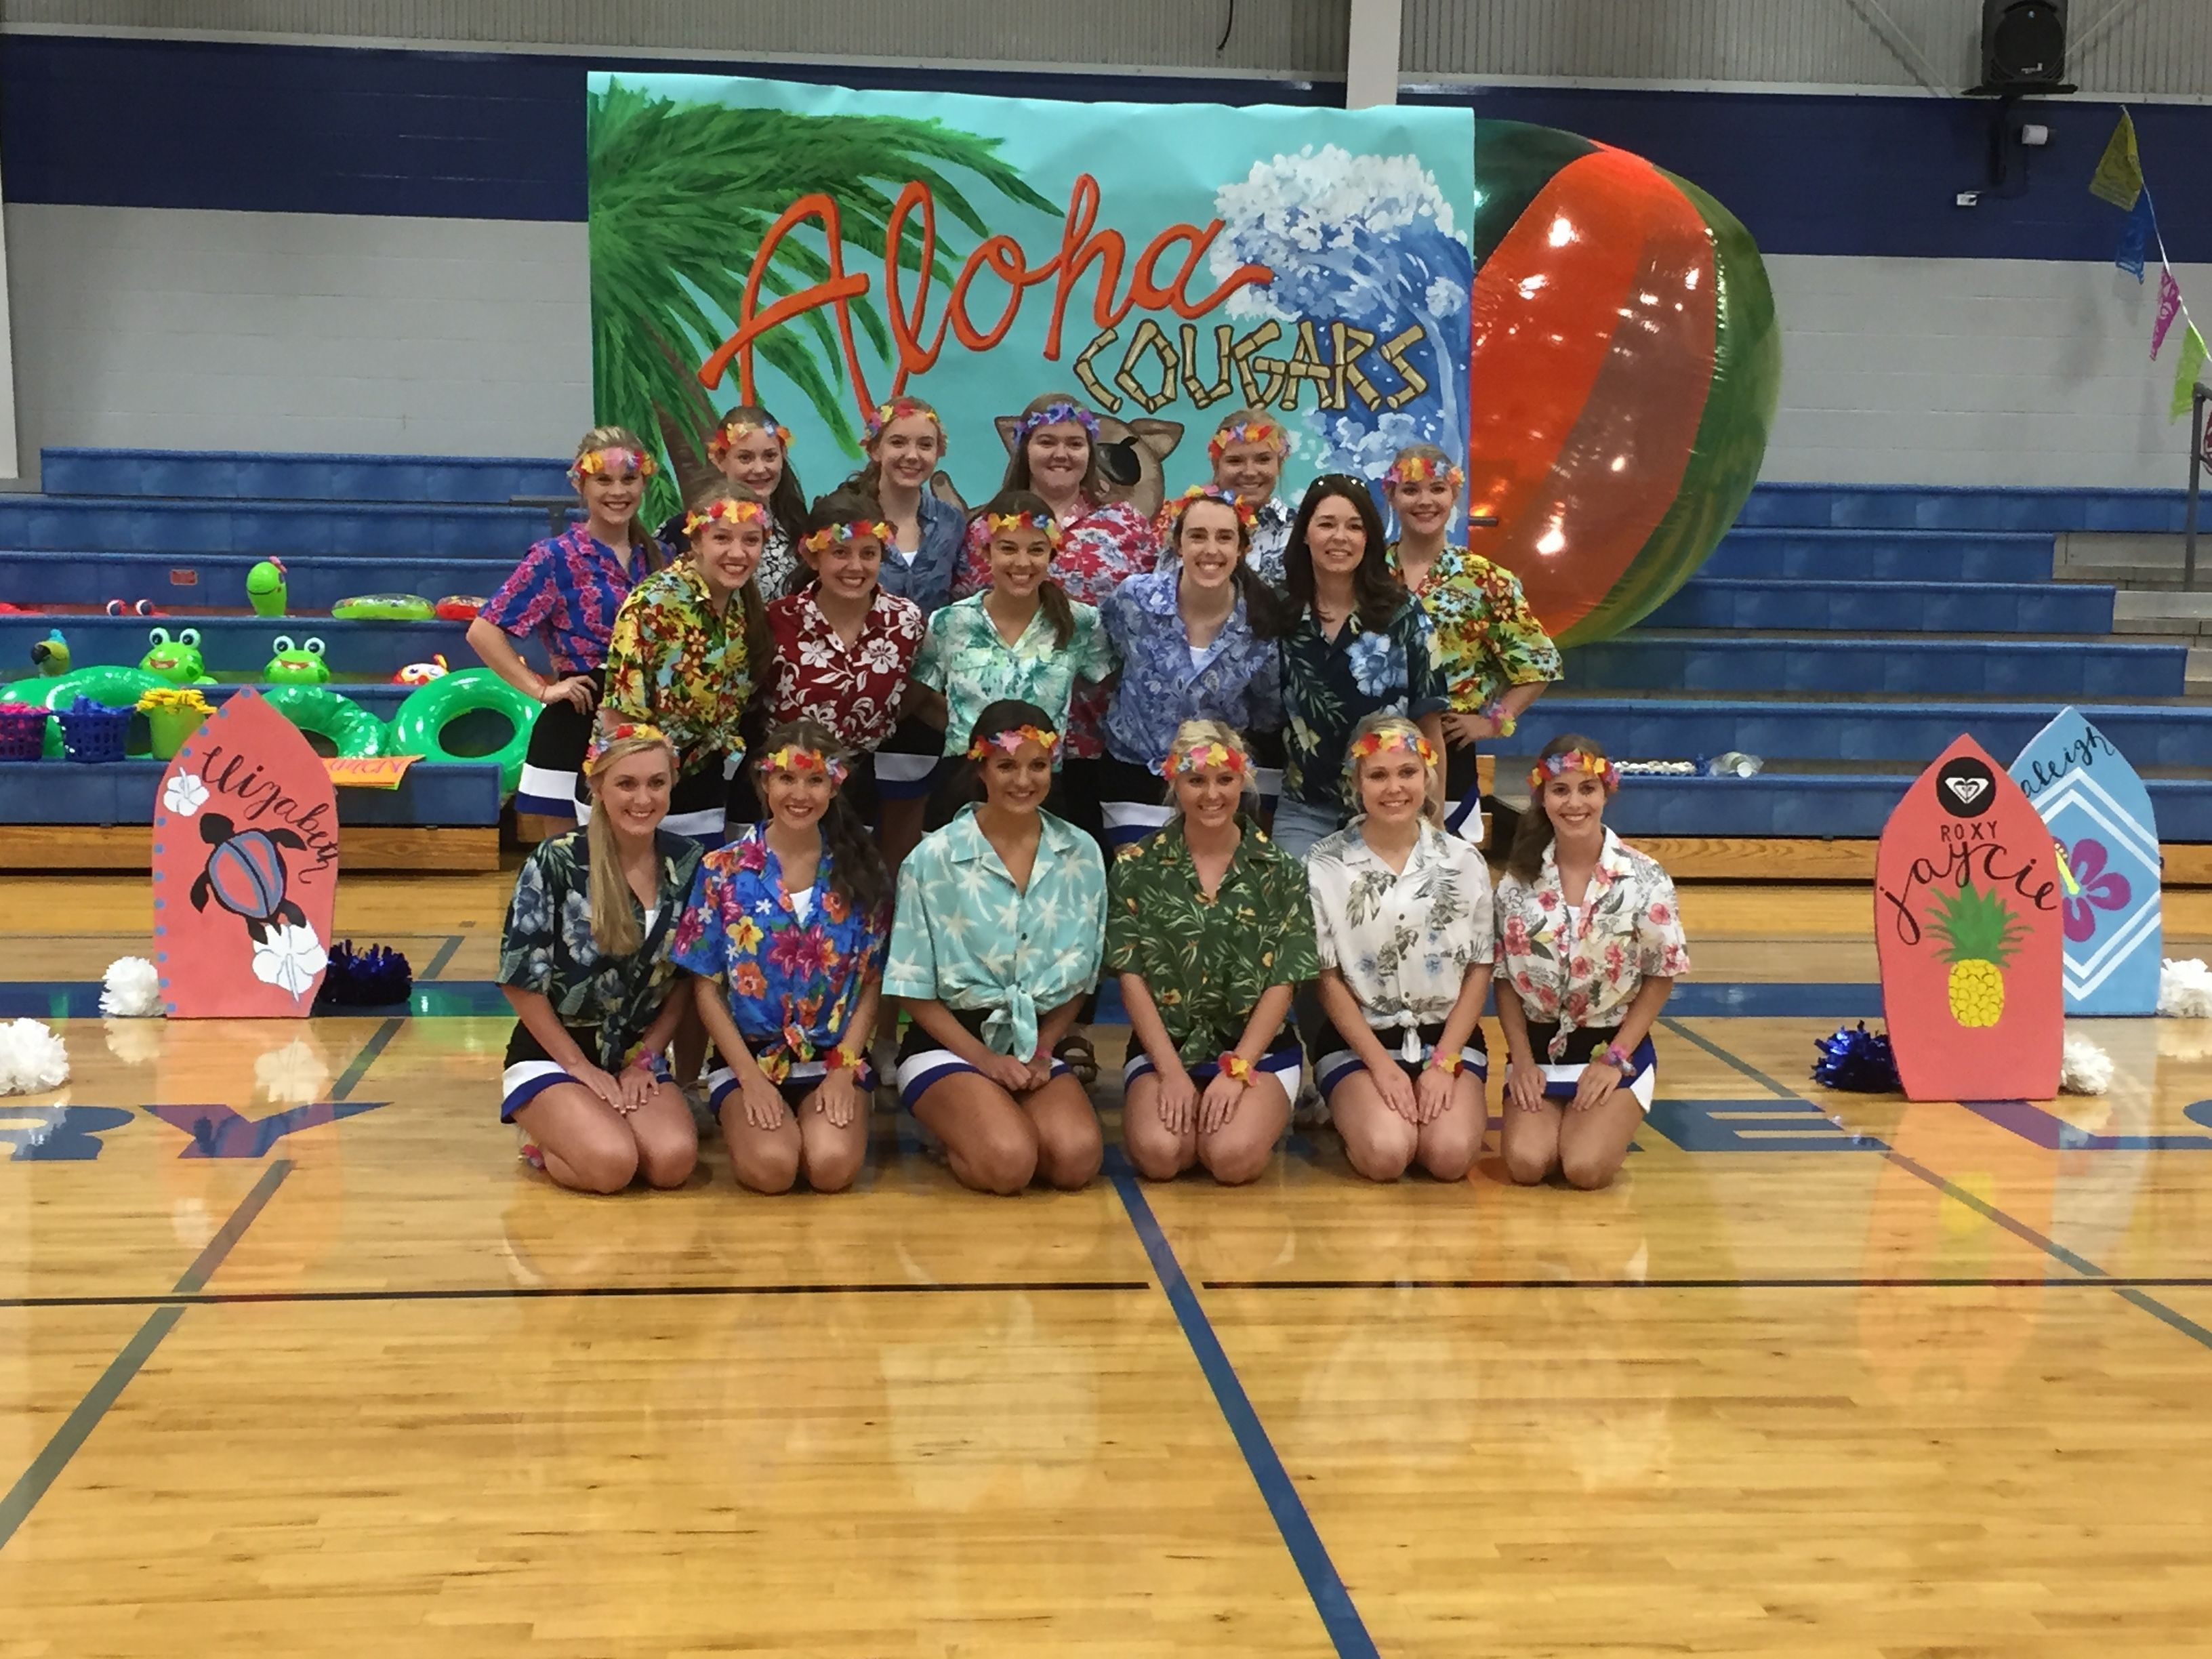 Hawaiian themed pep rally 82616 cheer team picture gcs